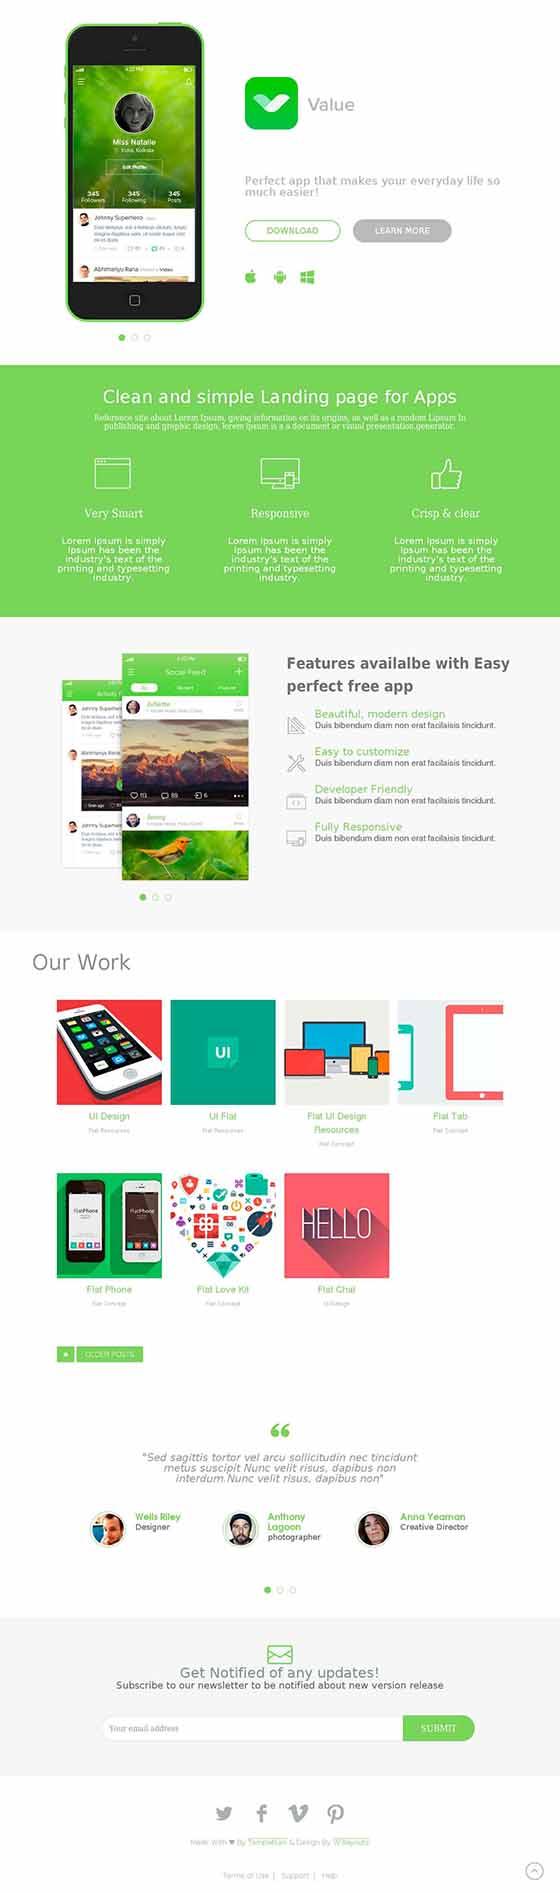 Plantillas responsive para crear paginas web usando Blogger ...